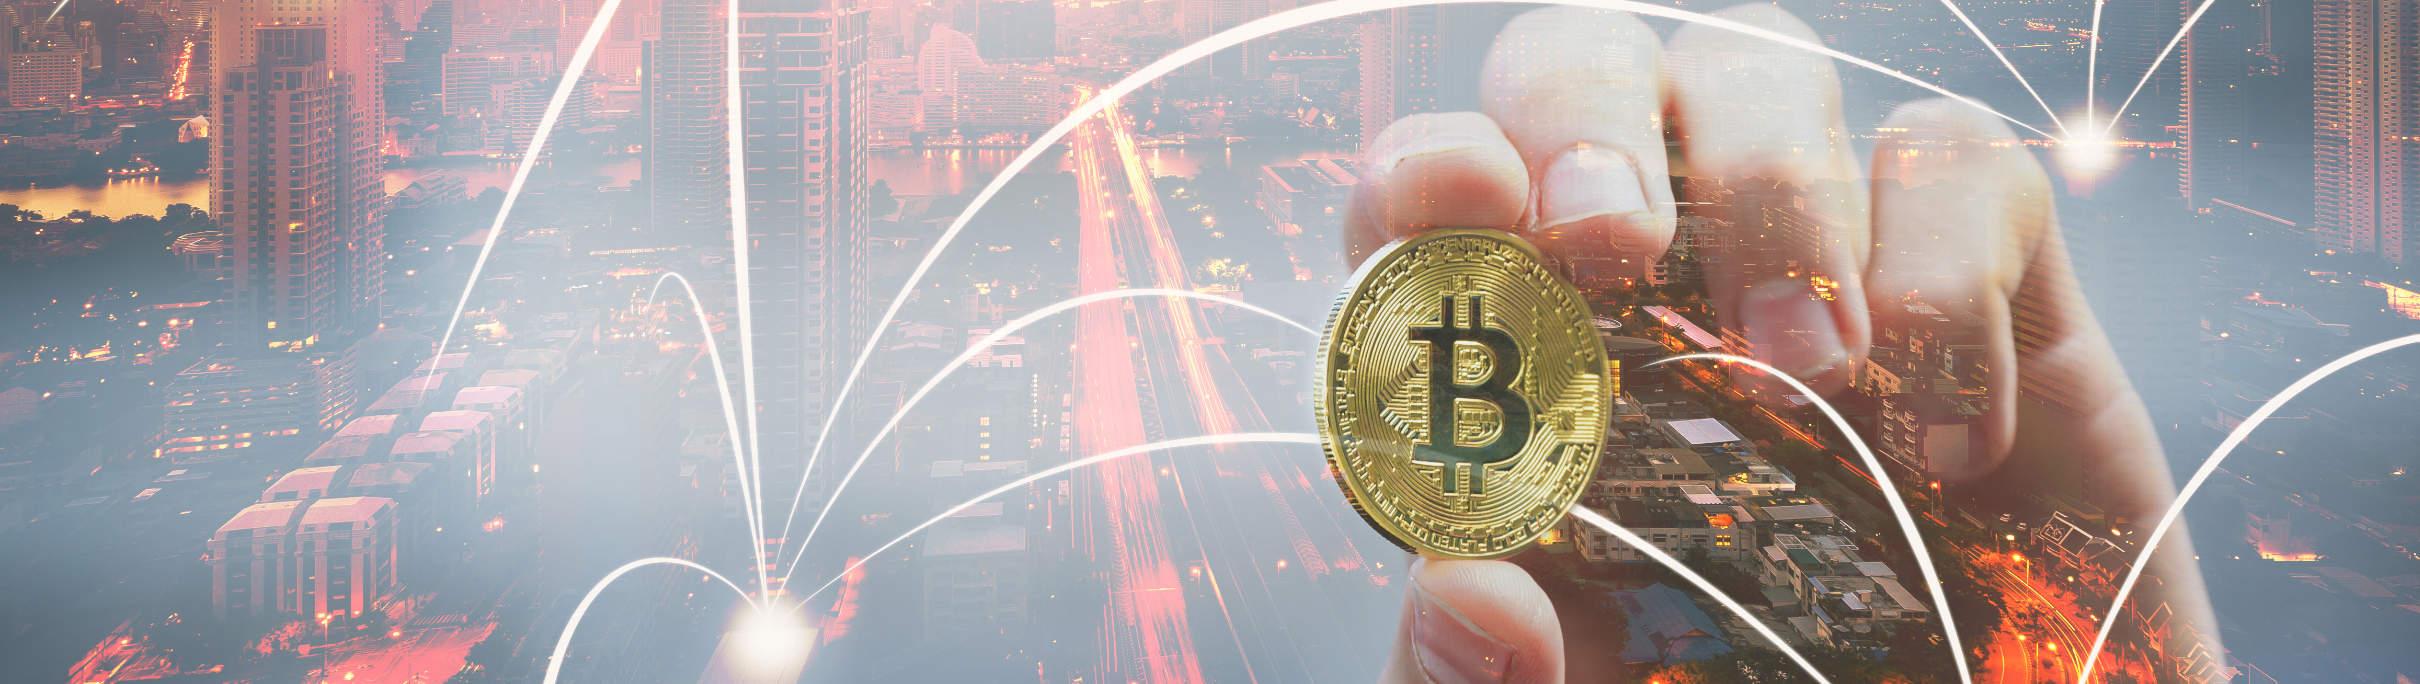 Bitcoin Revolução